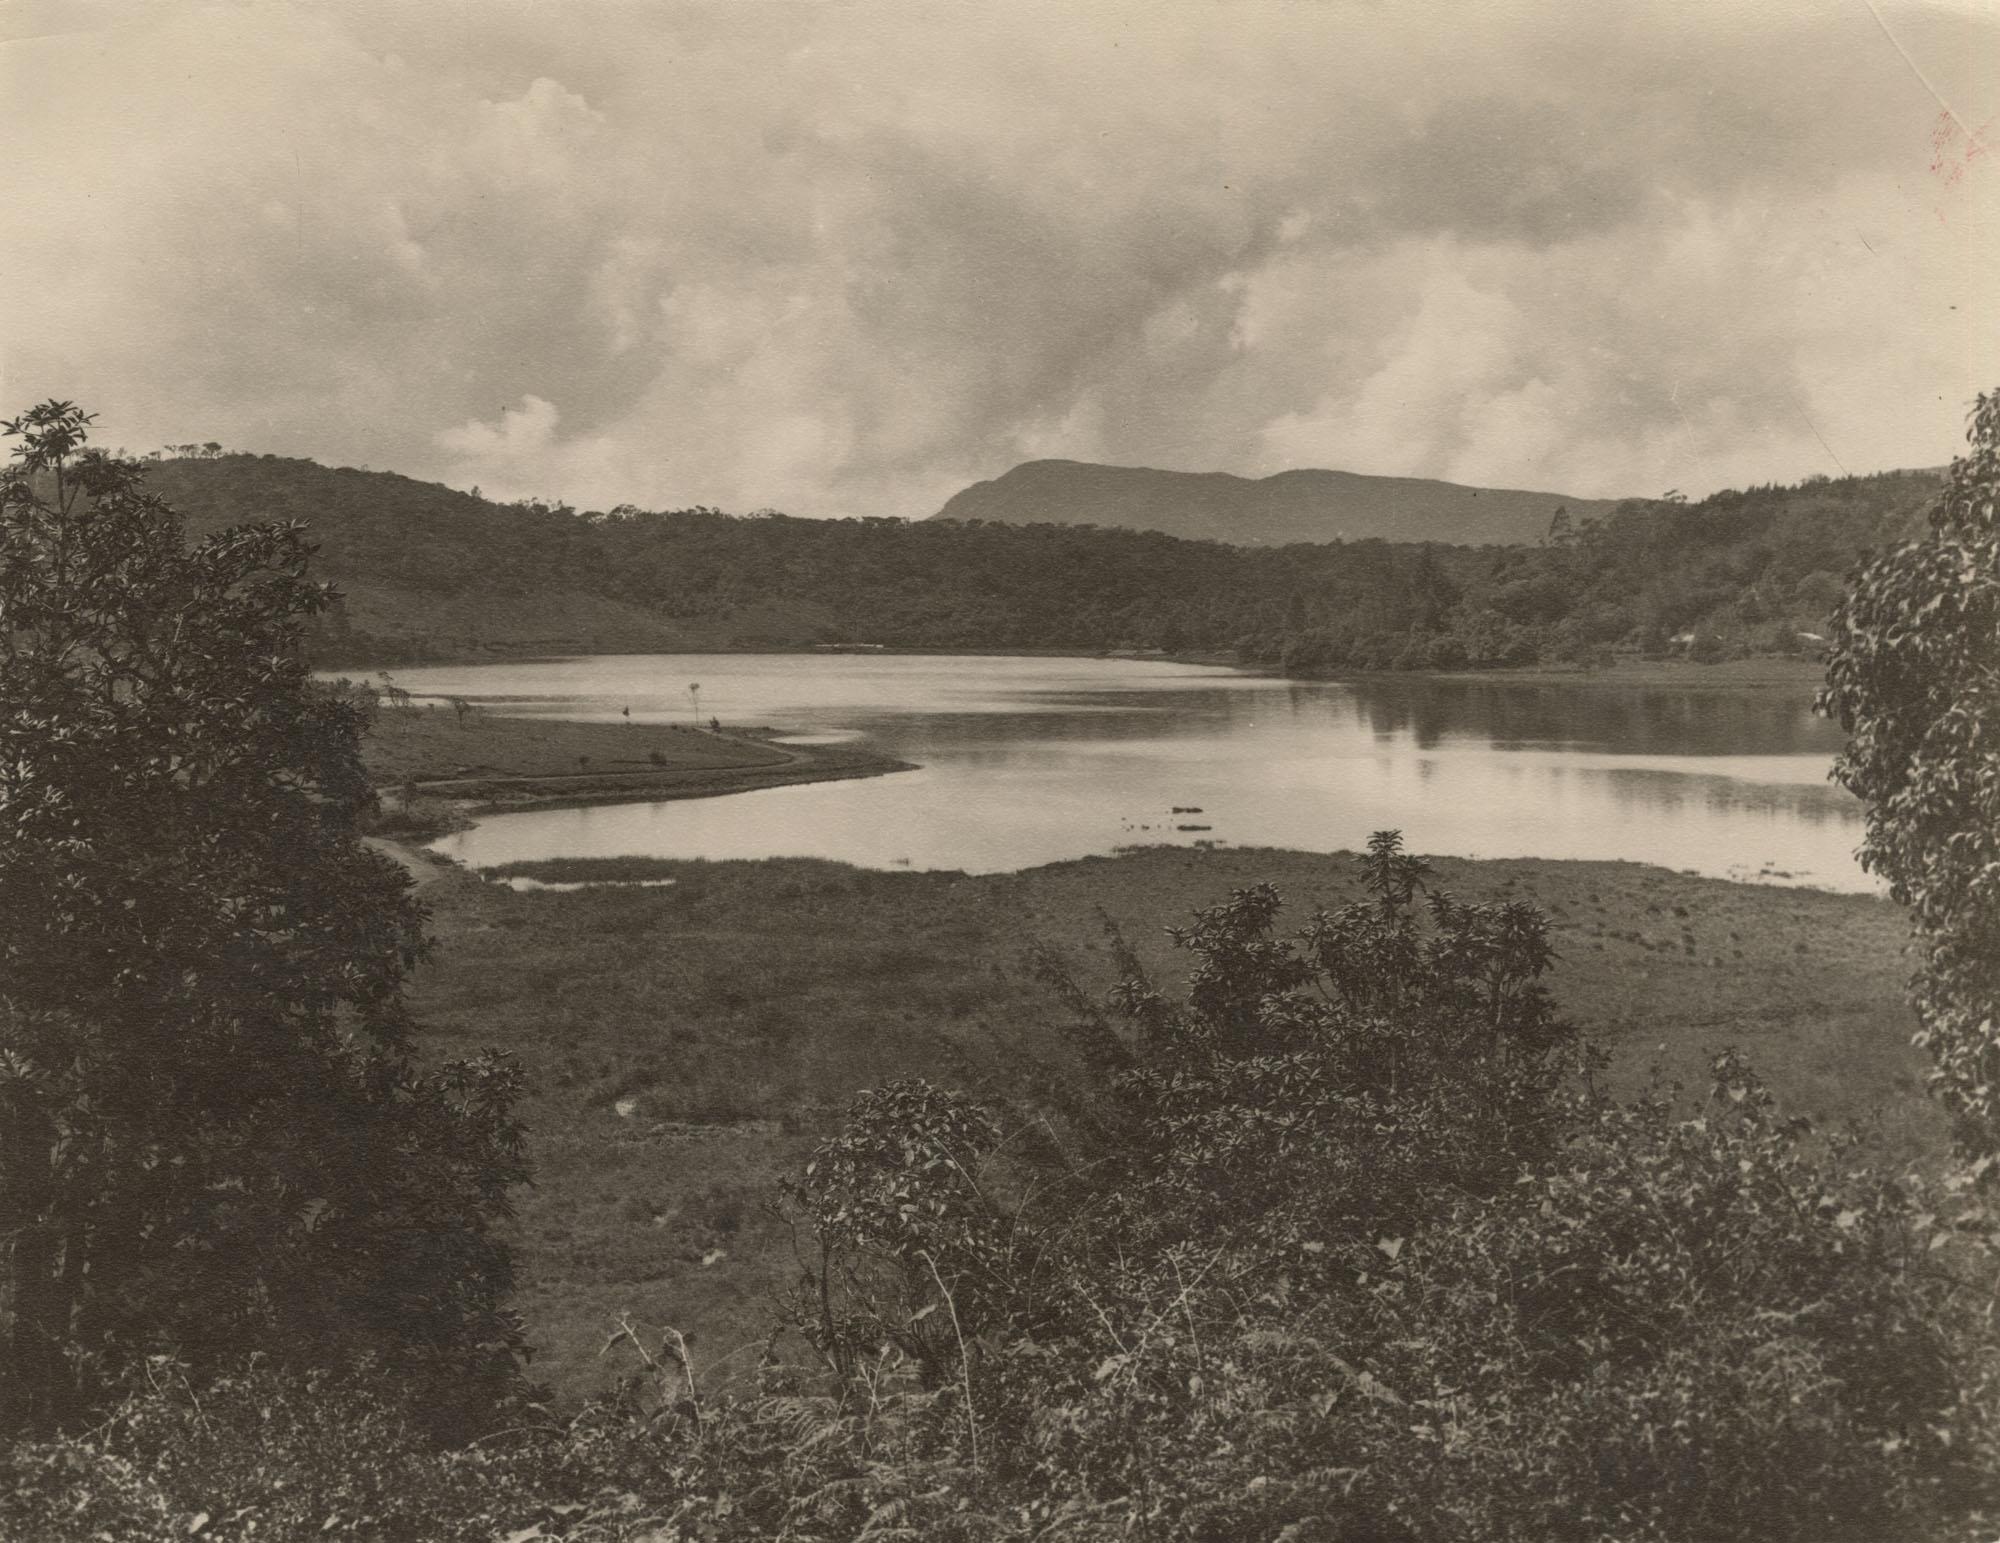 A landscape in Sri Lanka